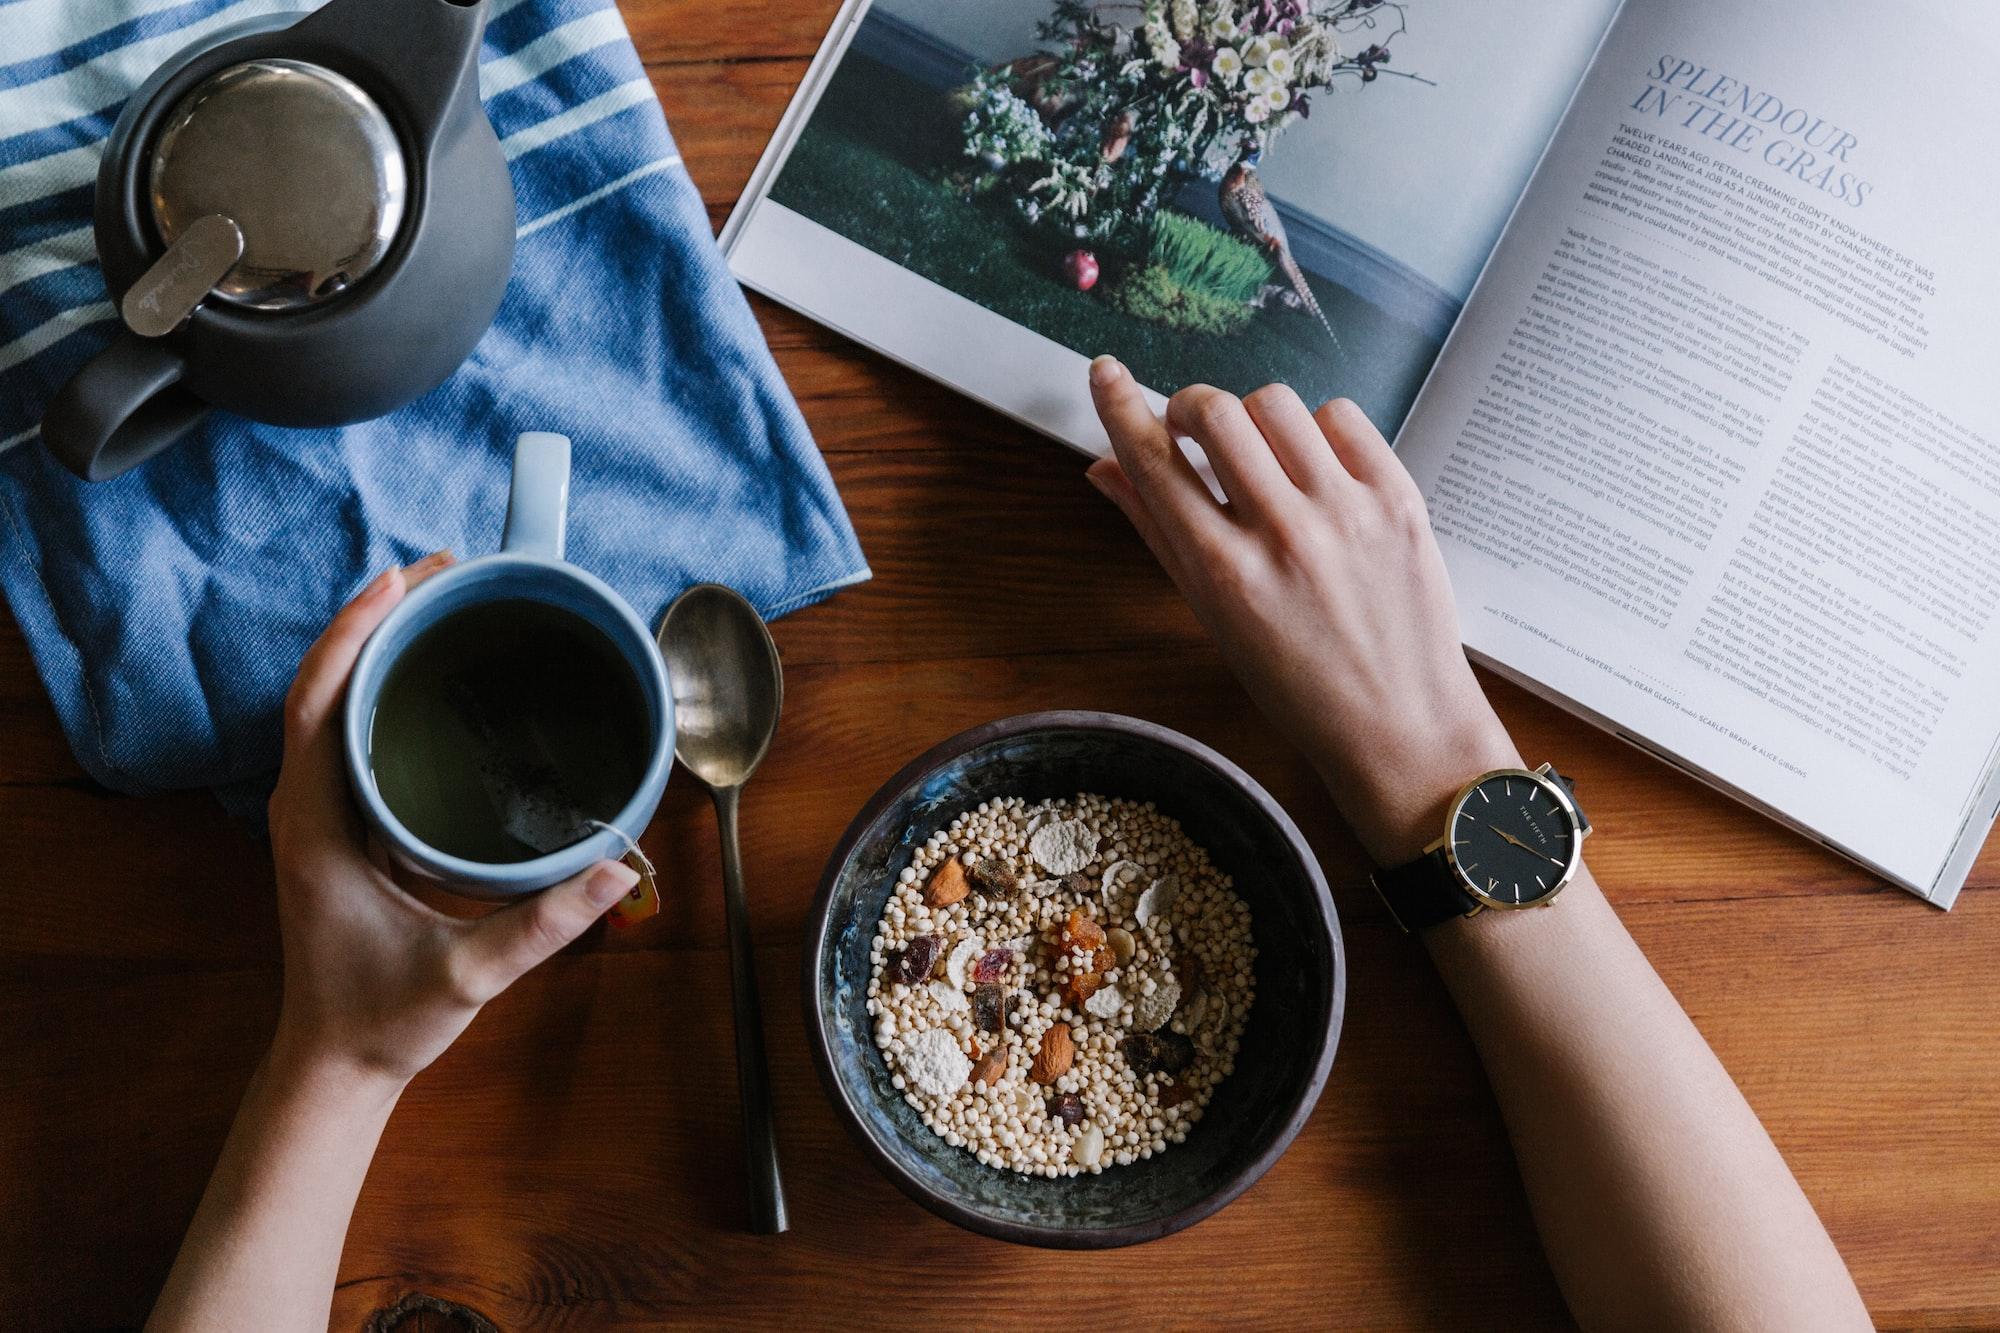 Morning Routines & Priming